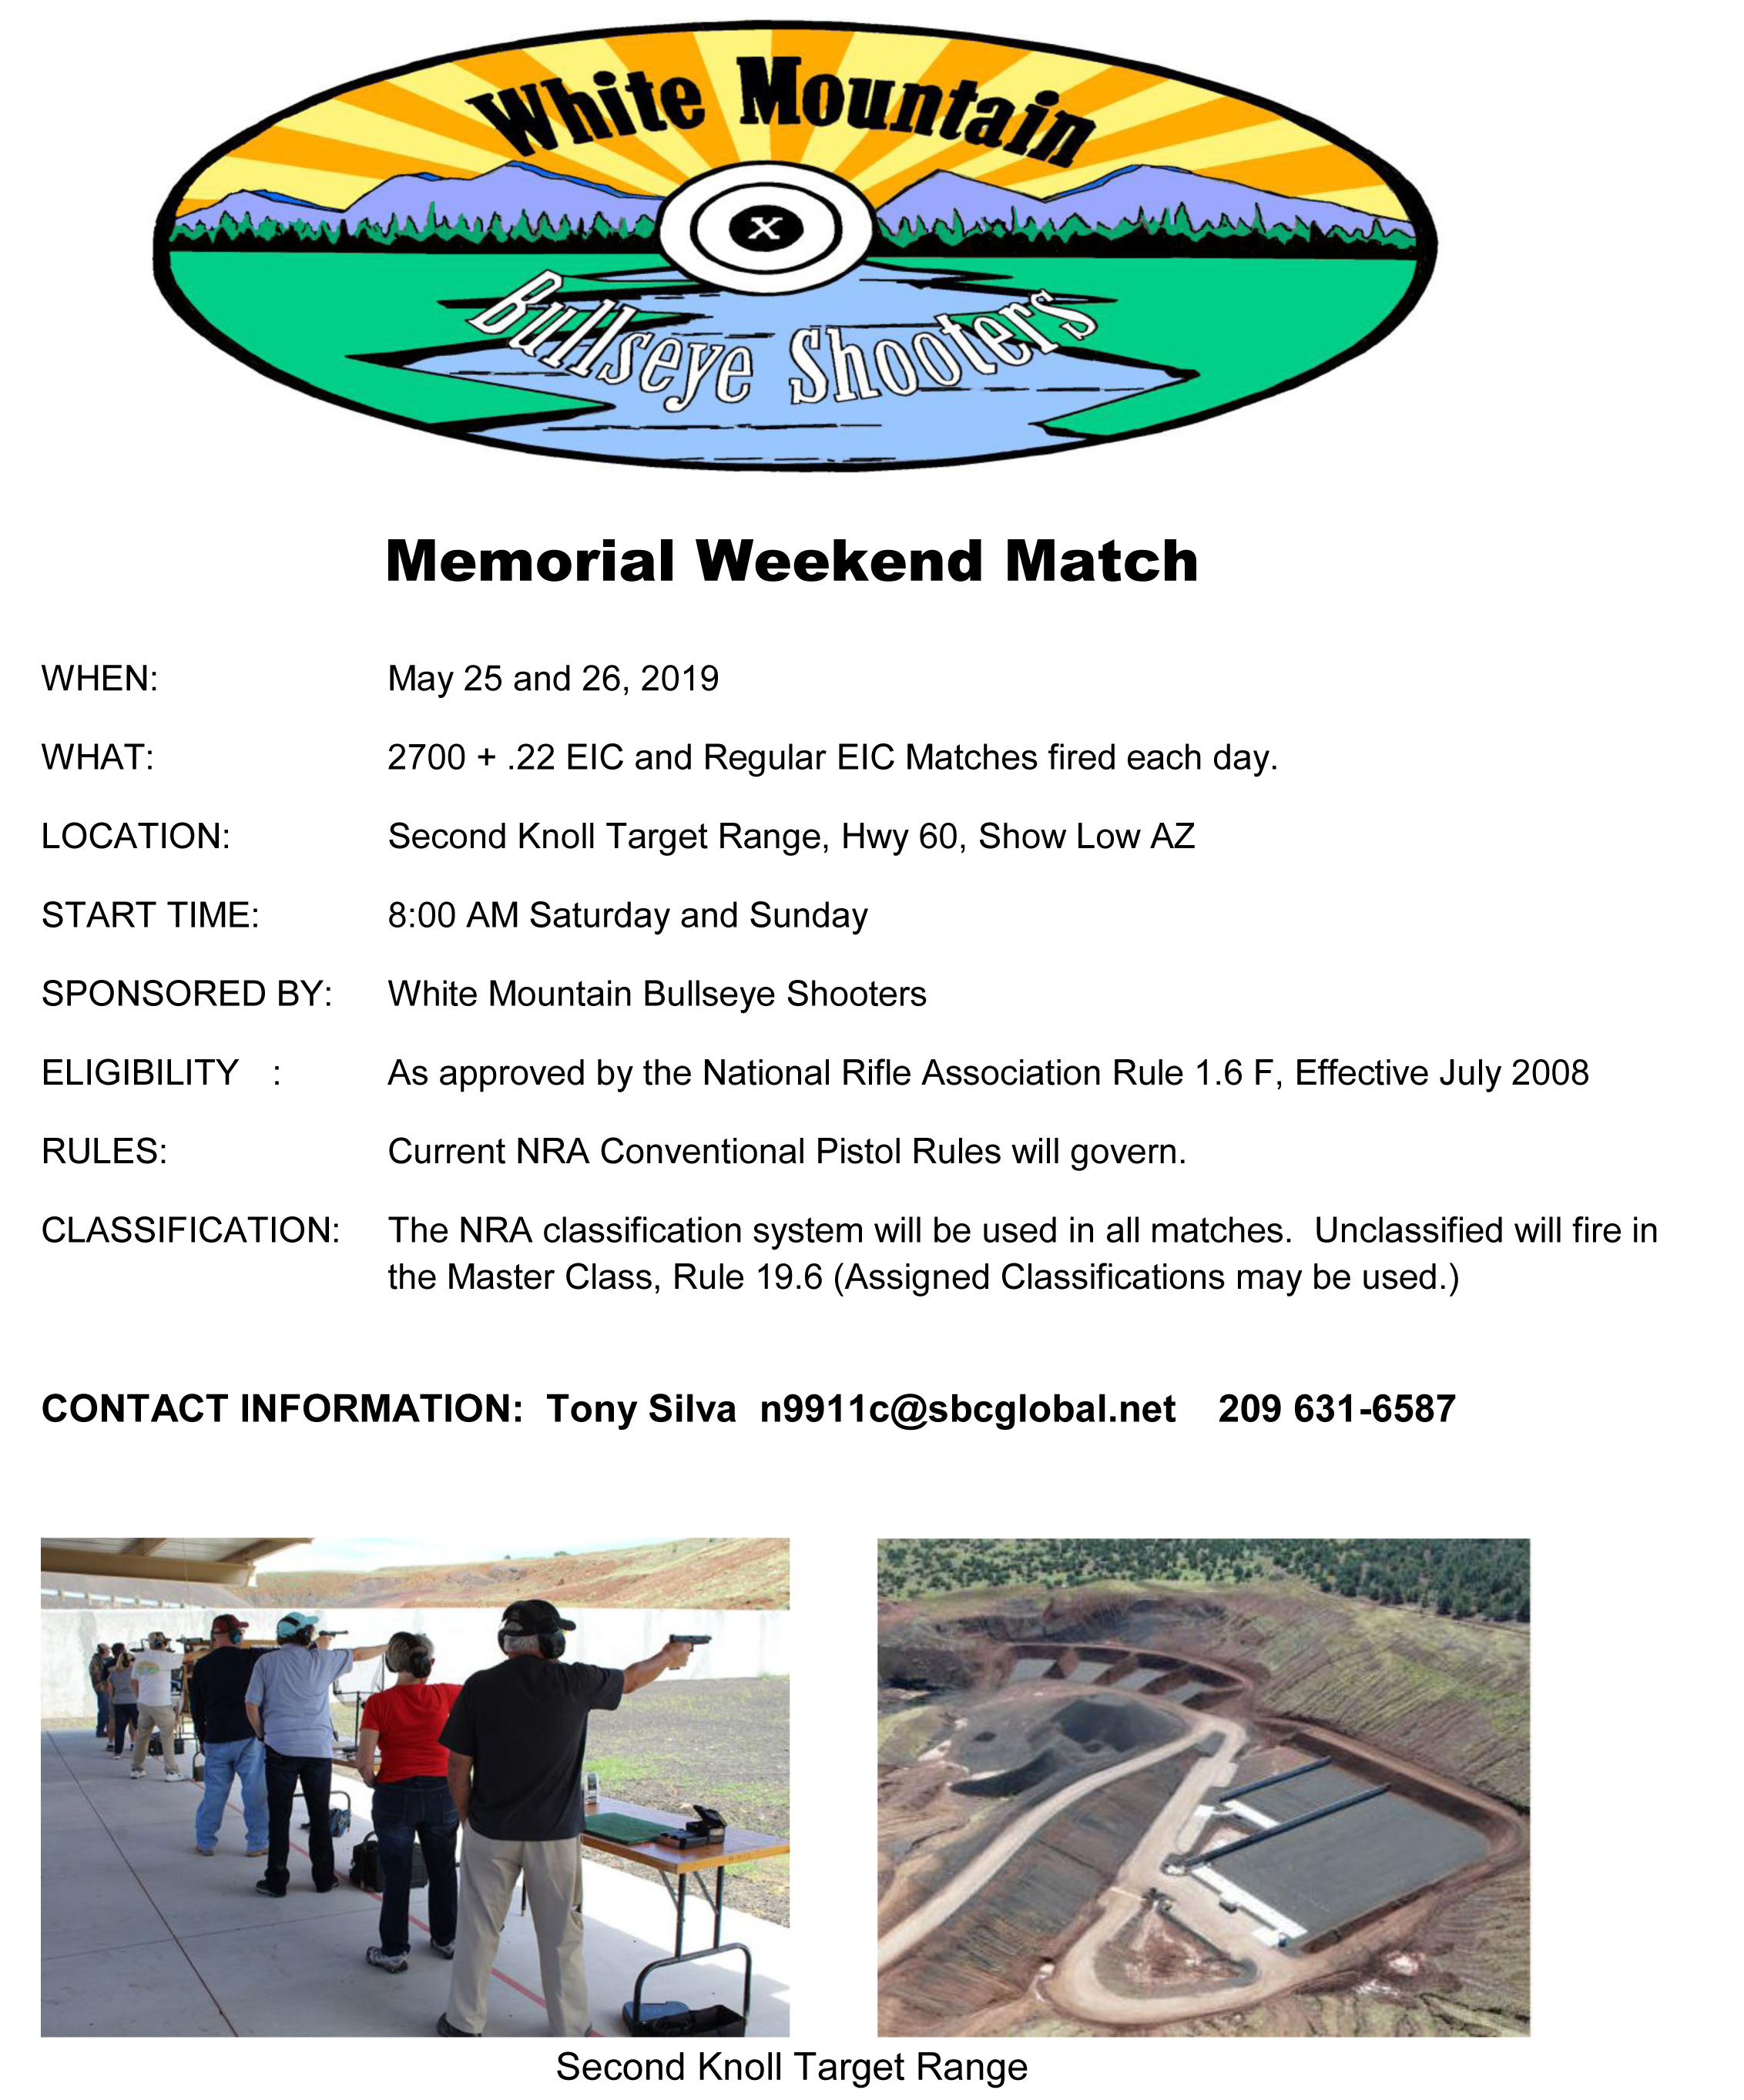 Memorial Weekend Match White Mountain Bullseye Shooters @ Second Knoll Target Range